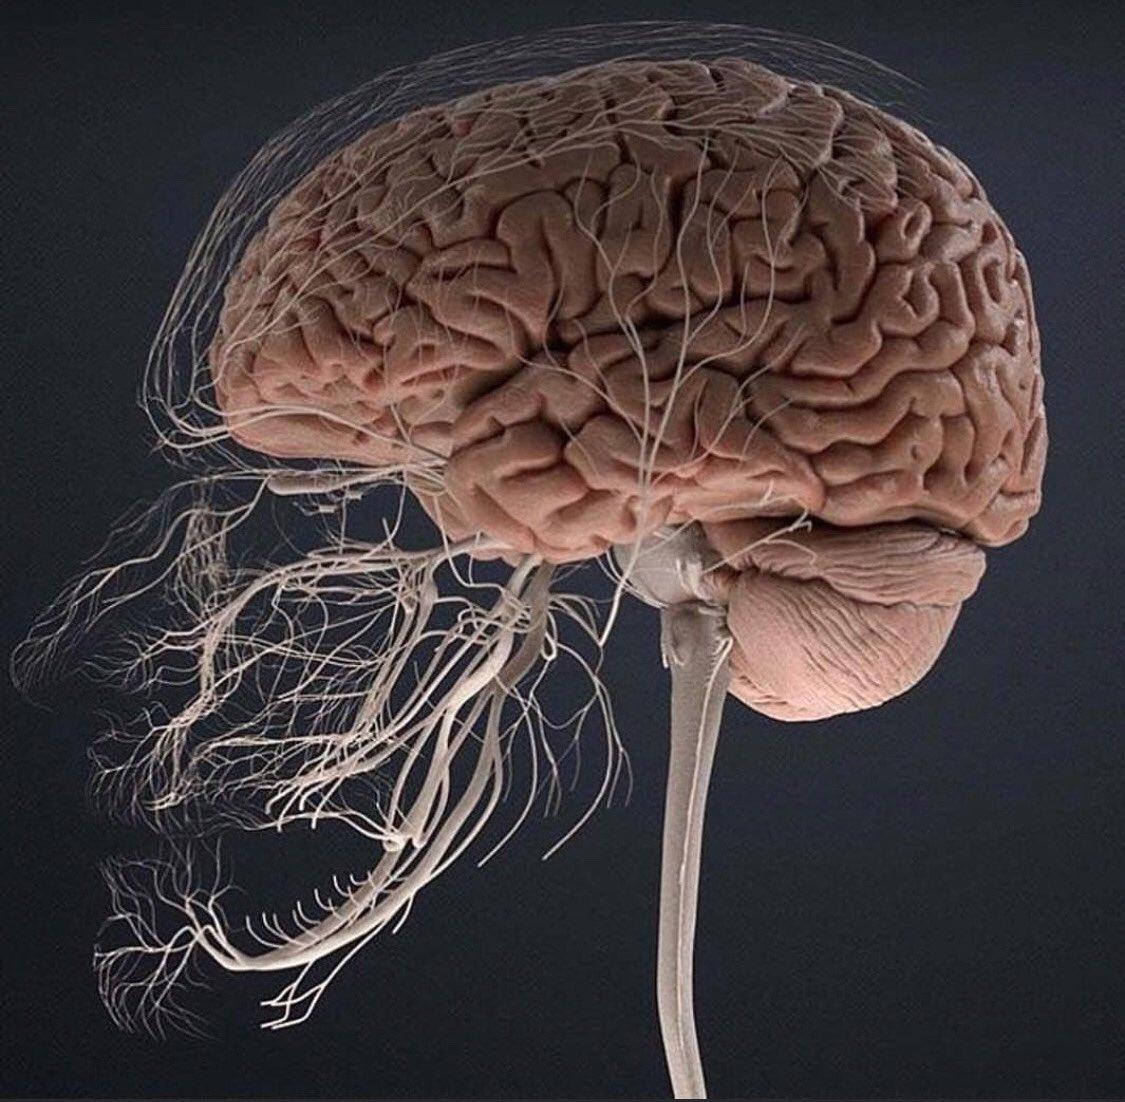 картинка мозговой центр домкрат редко